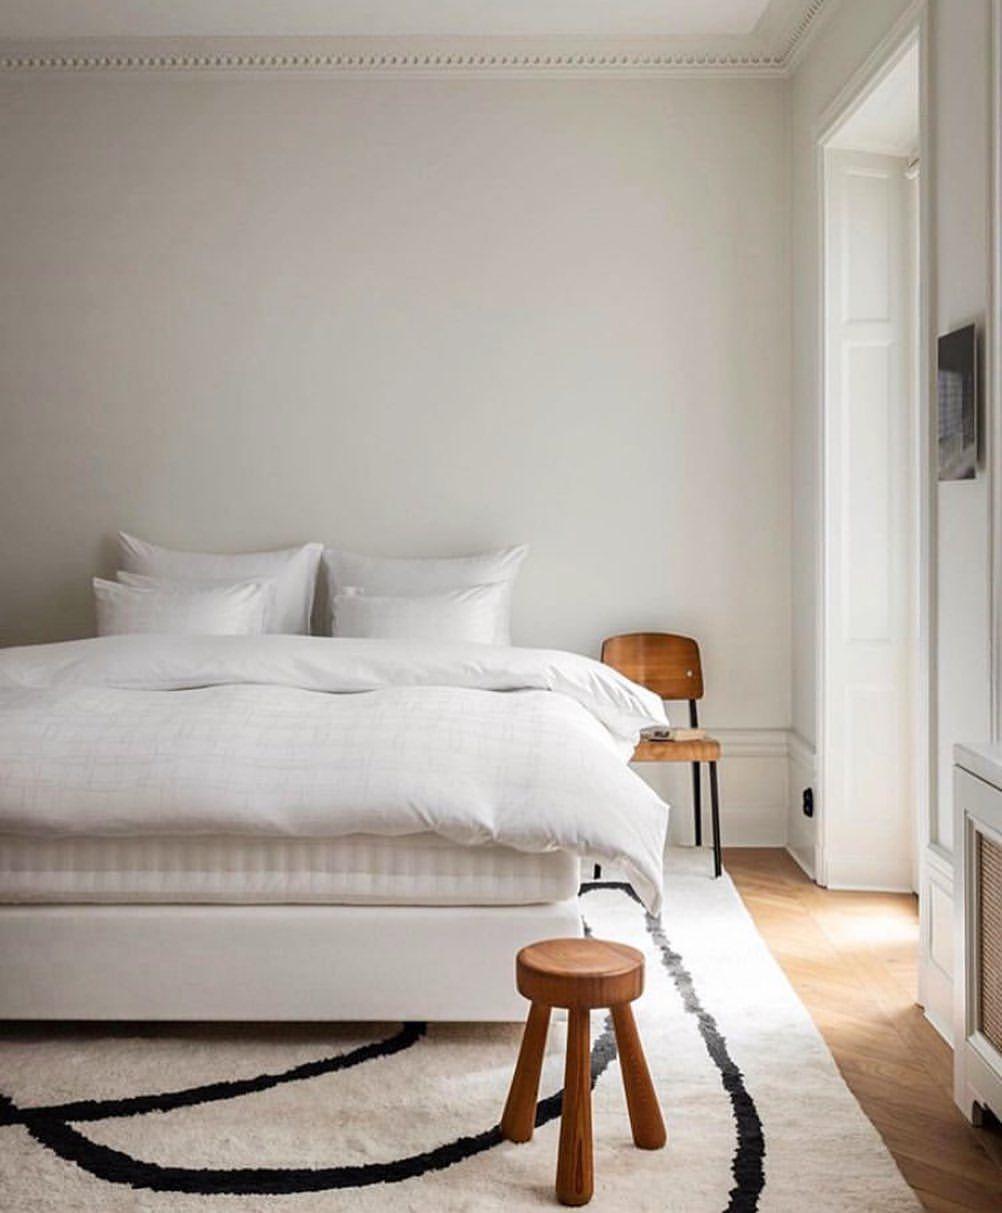 "DECOR NO5 on Instagram: ""@fredrikkarlssoninteriors #decorno5 #decor #interiordesign #interiorinspiration #london #homeinspiration #interiorinspo #design #interiors…"""